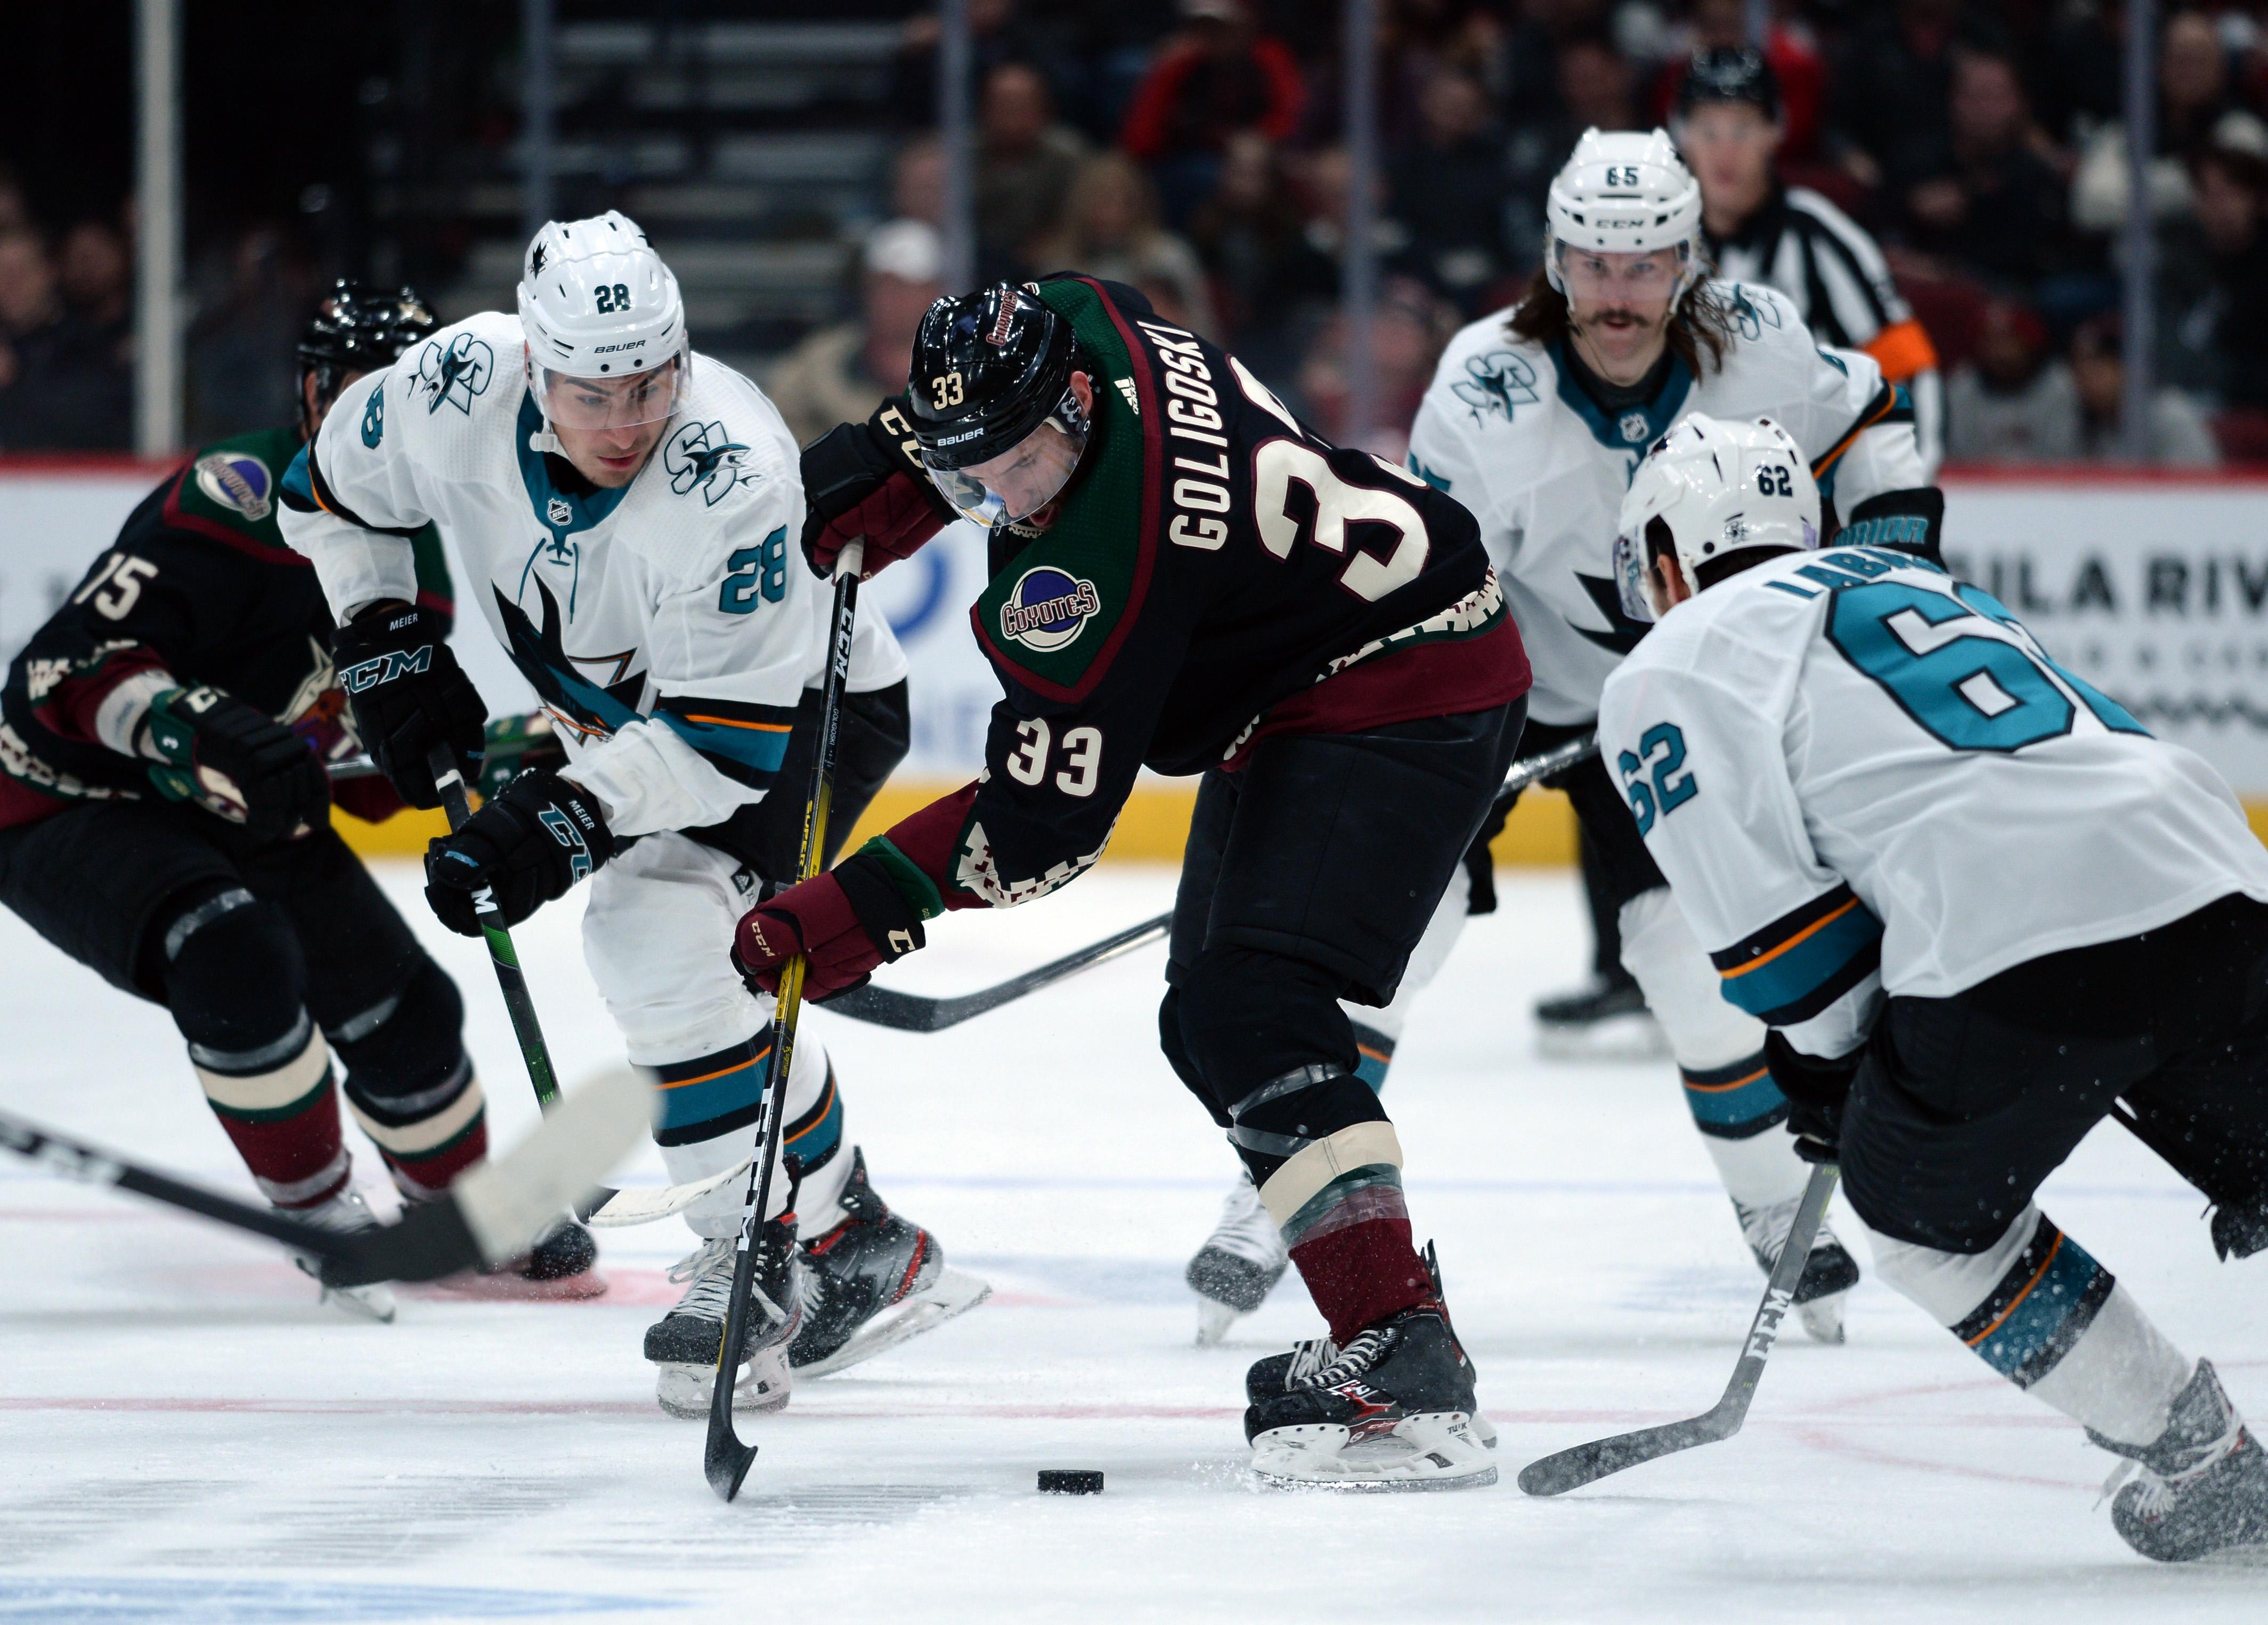 Nov 30, 2019; Glendale, AZ, USA; Arizona Coyotes defenseman Alex Goligoski (33) skates with the puck against the San Jose Sharks during the third period at Gila River Arena.